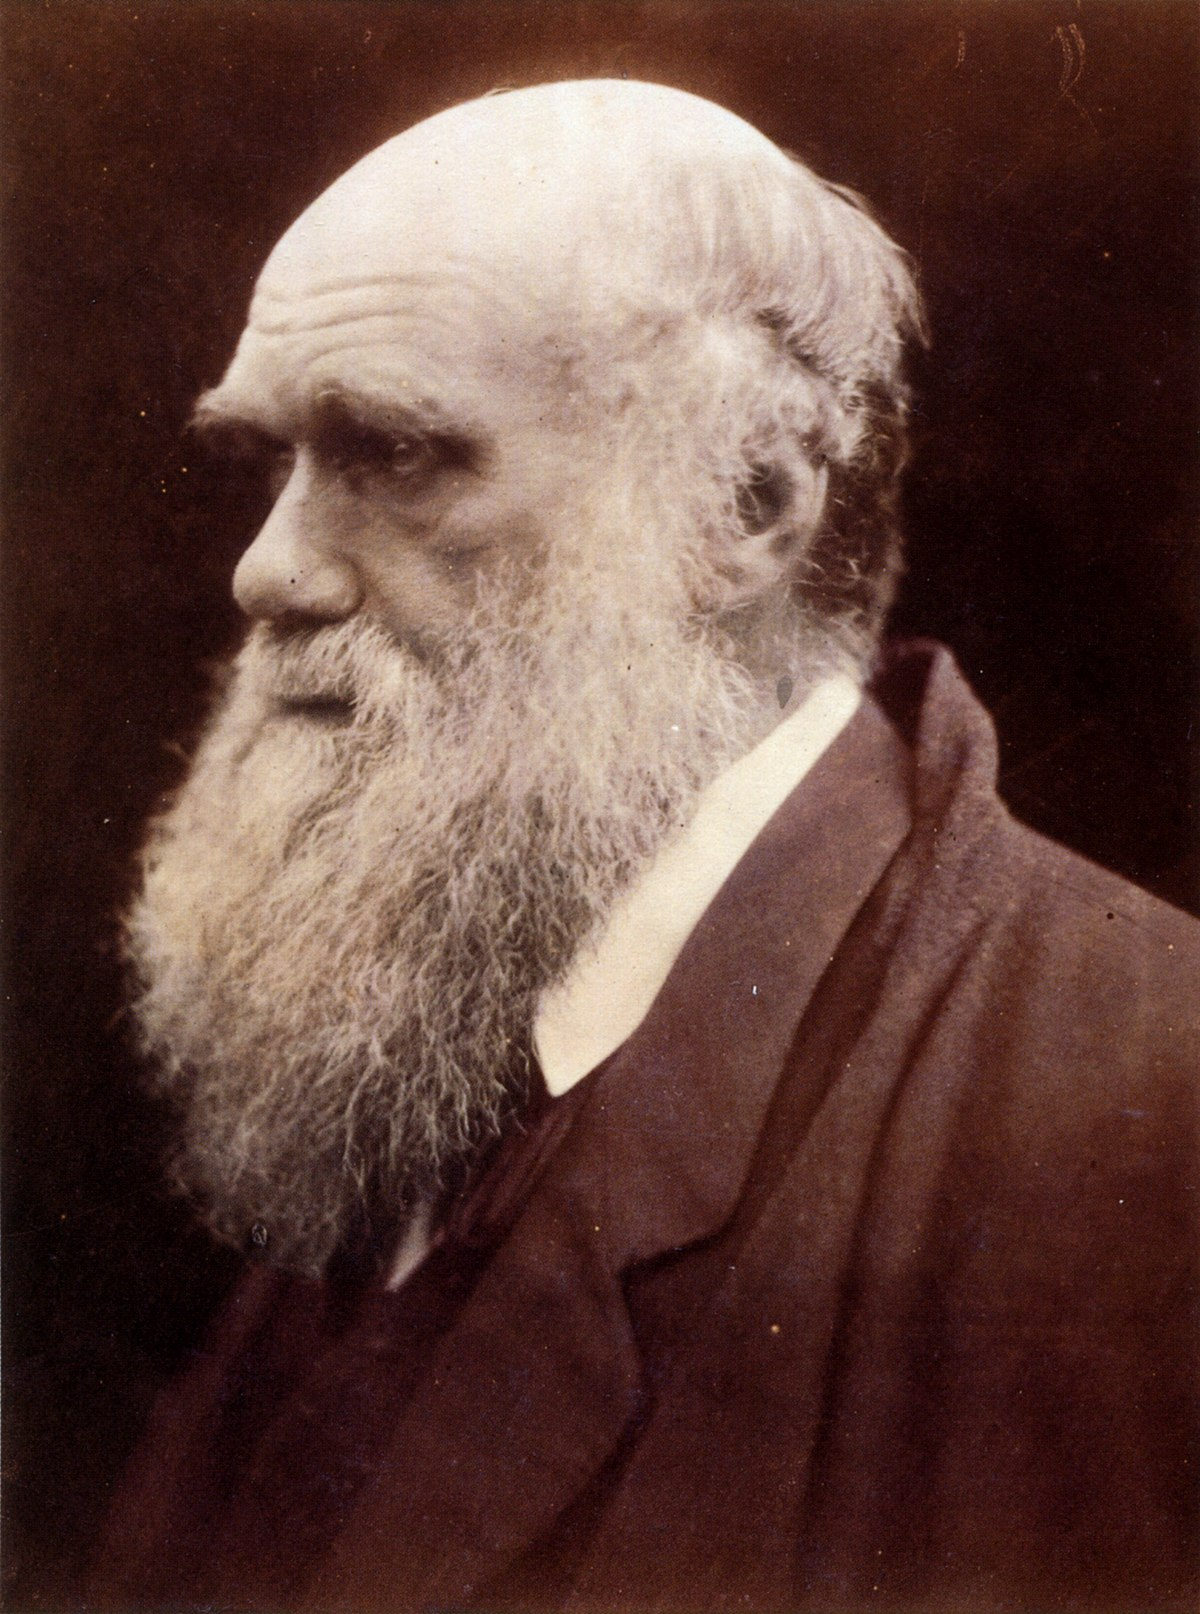 Religious views of Charles Darwin - Wikipedia